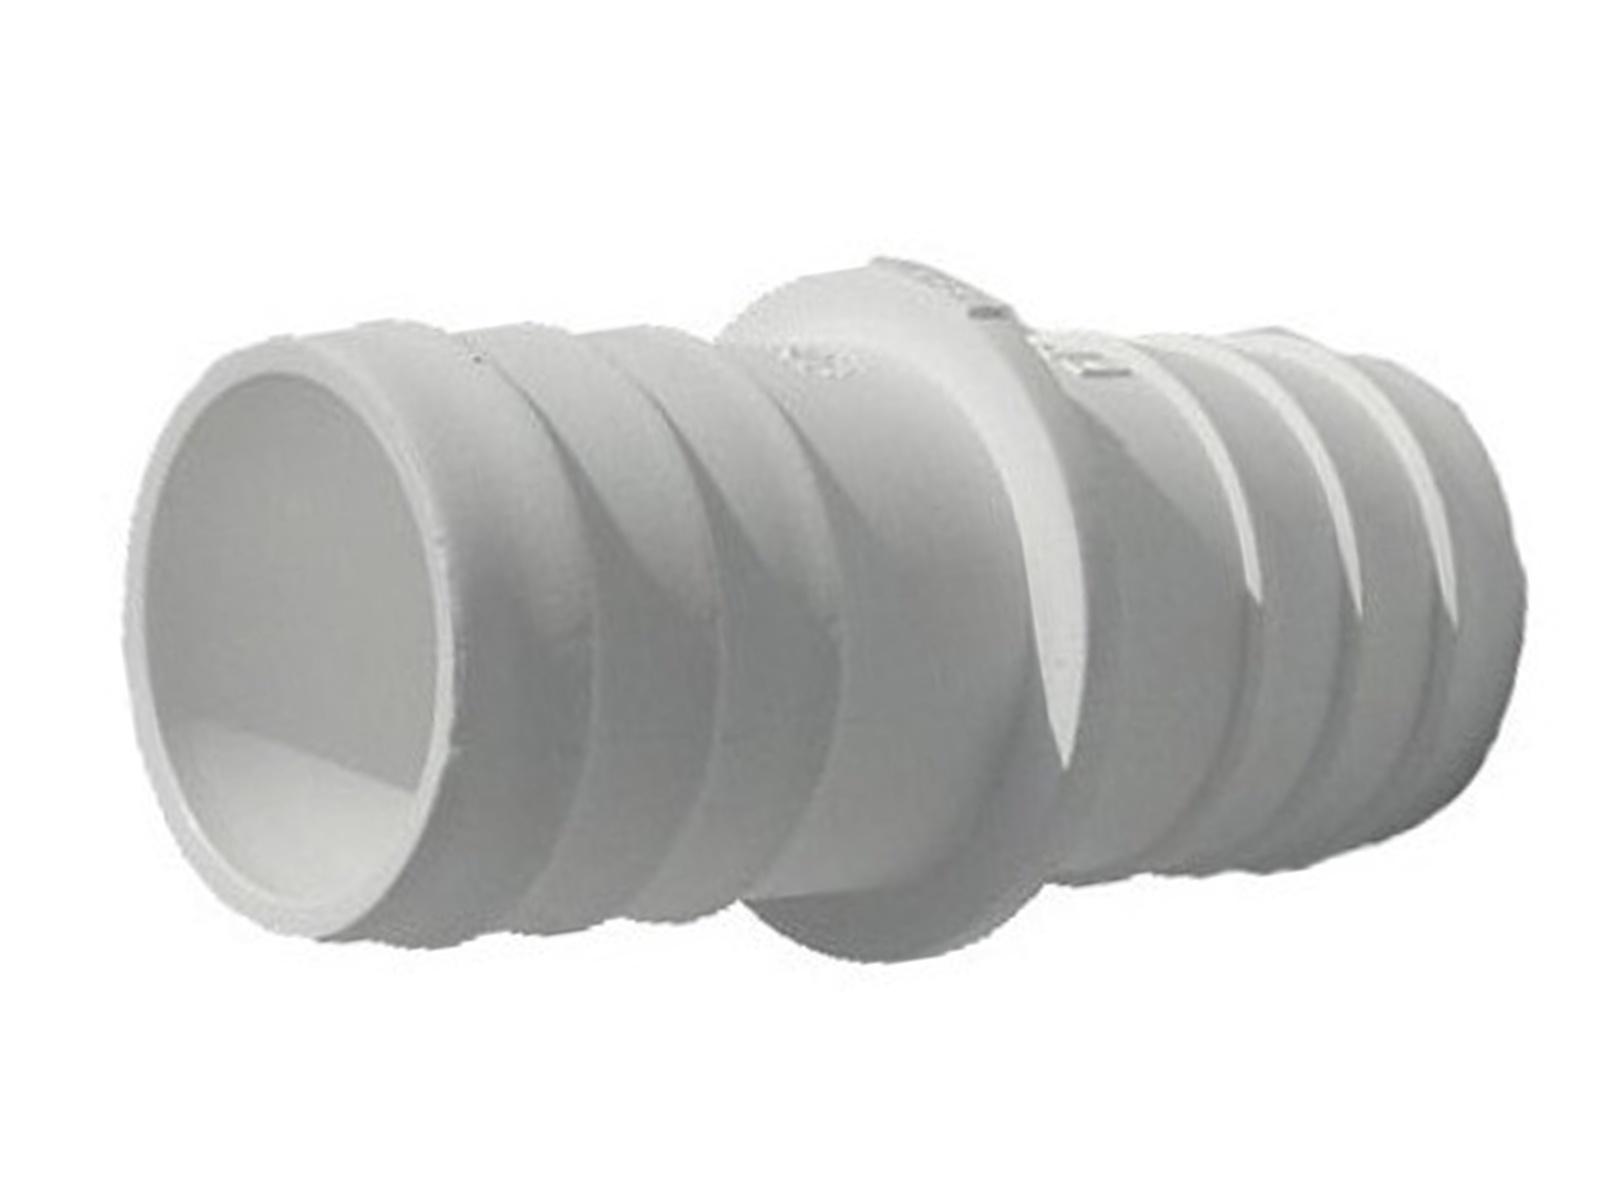 Bazénová spojka hadice MARIMEX 32 mm